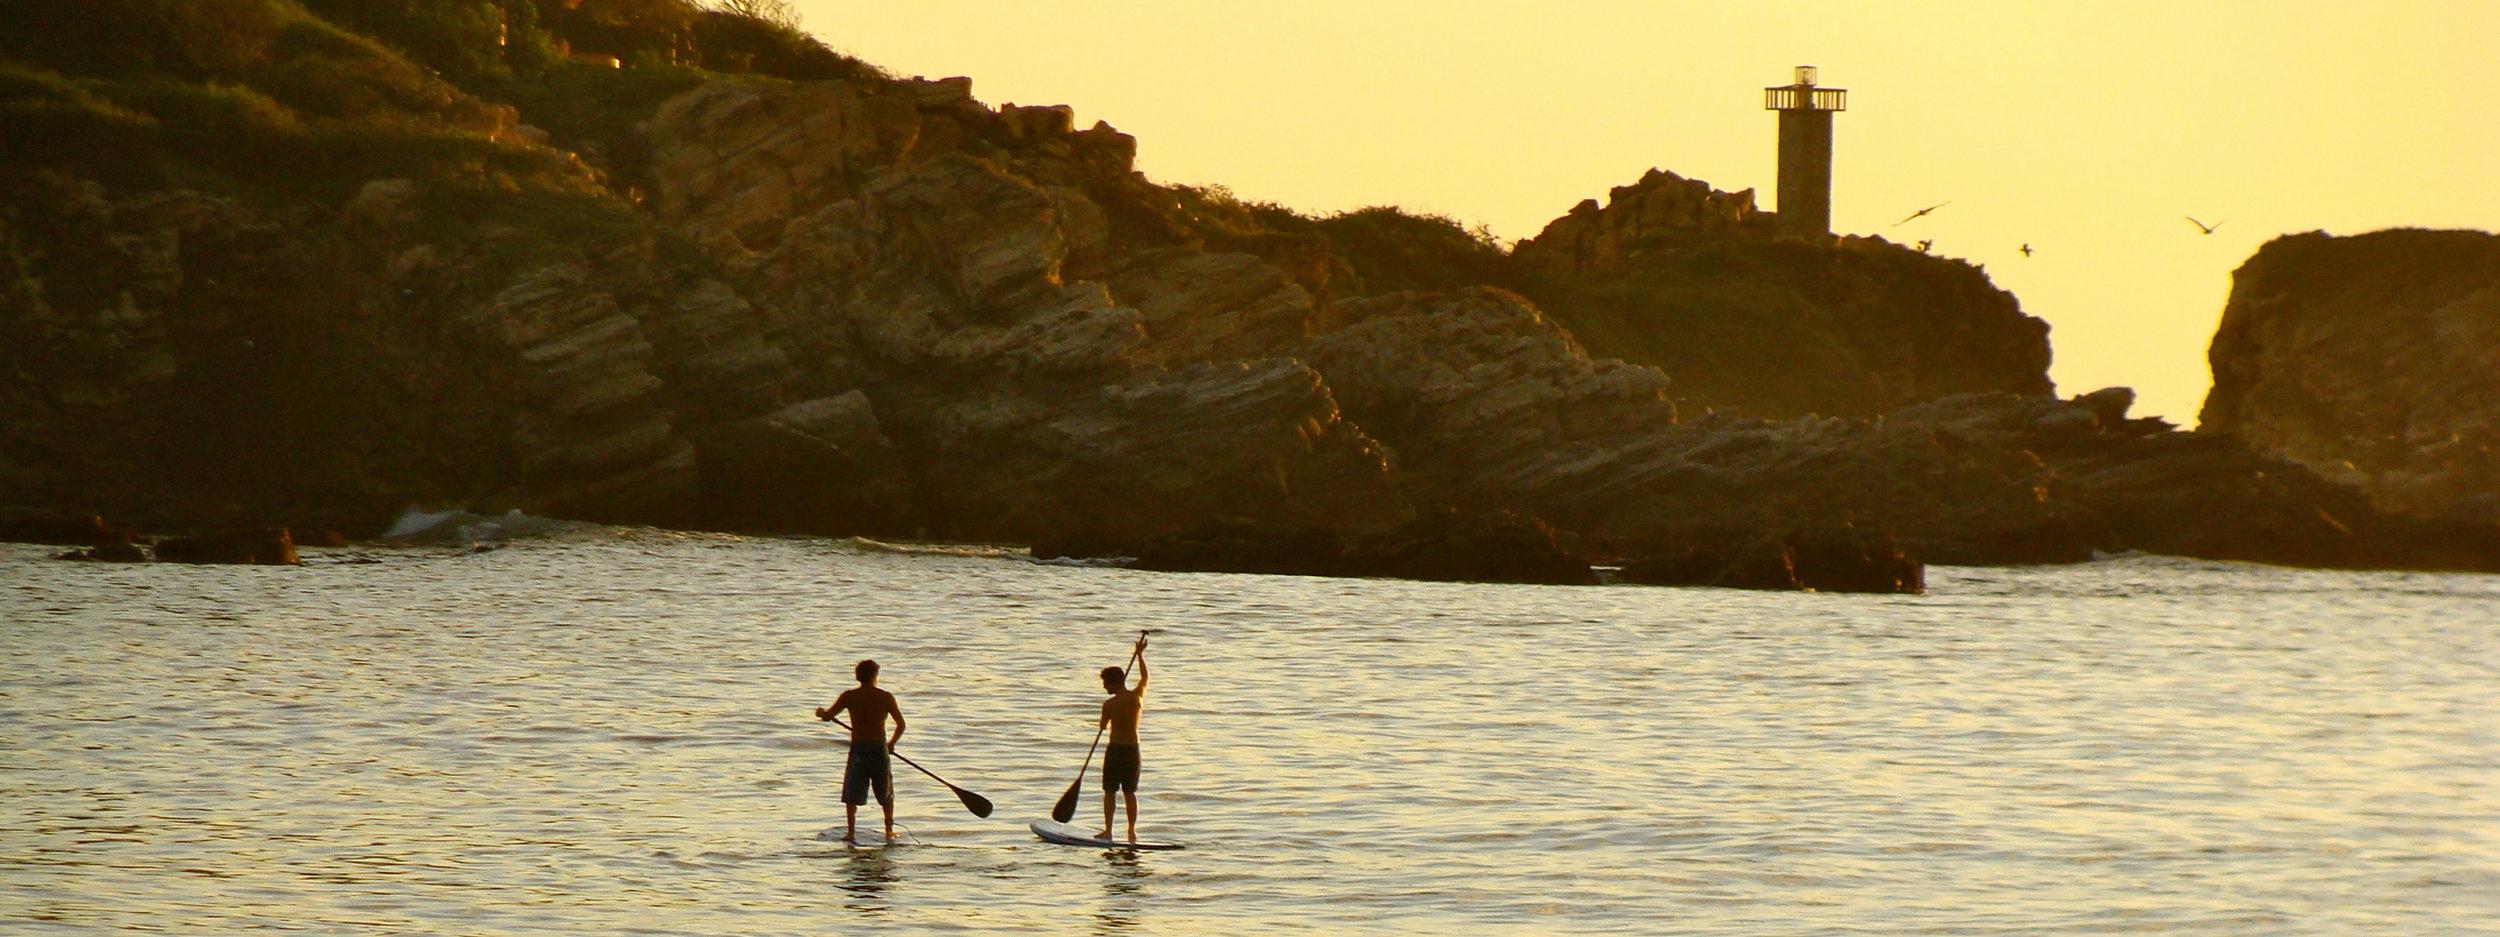 Explore the Coastline Paddleboarding - Puerto Escondido